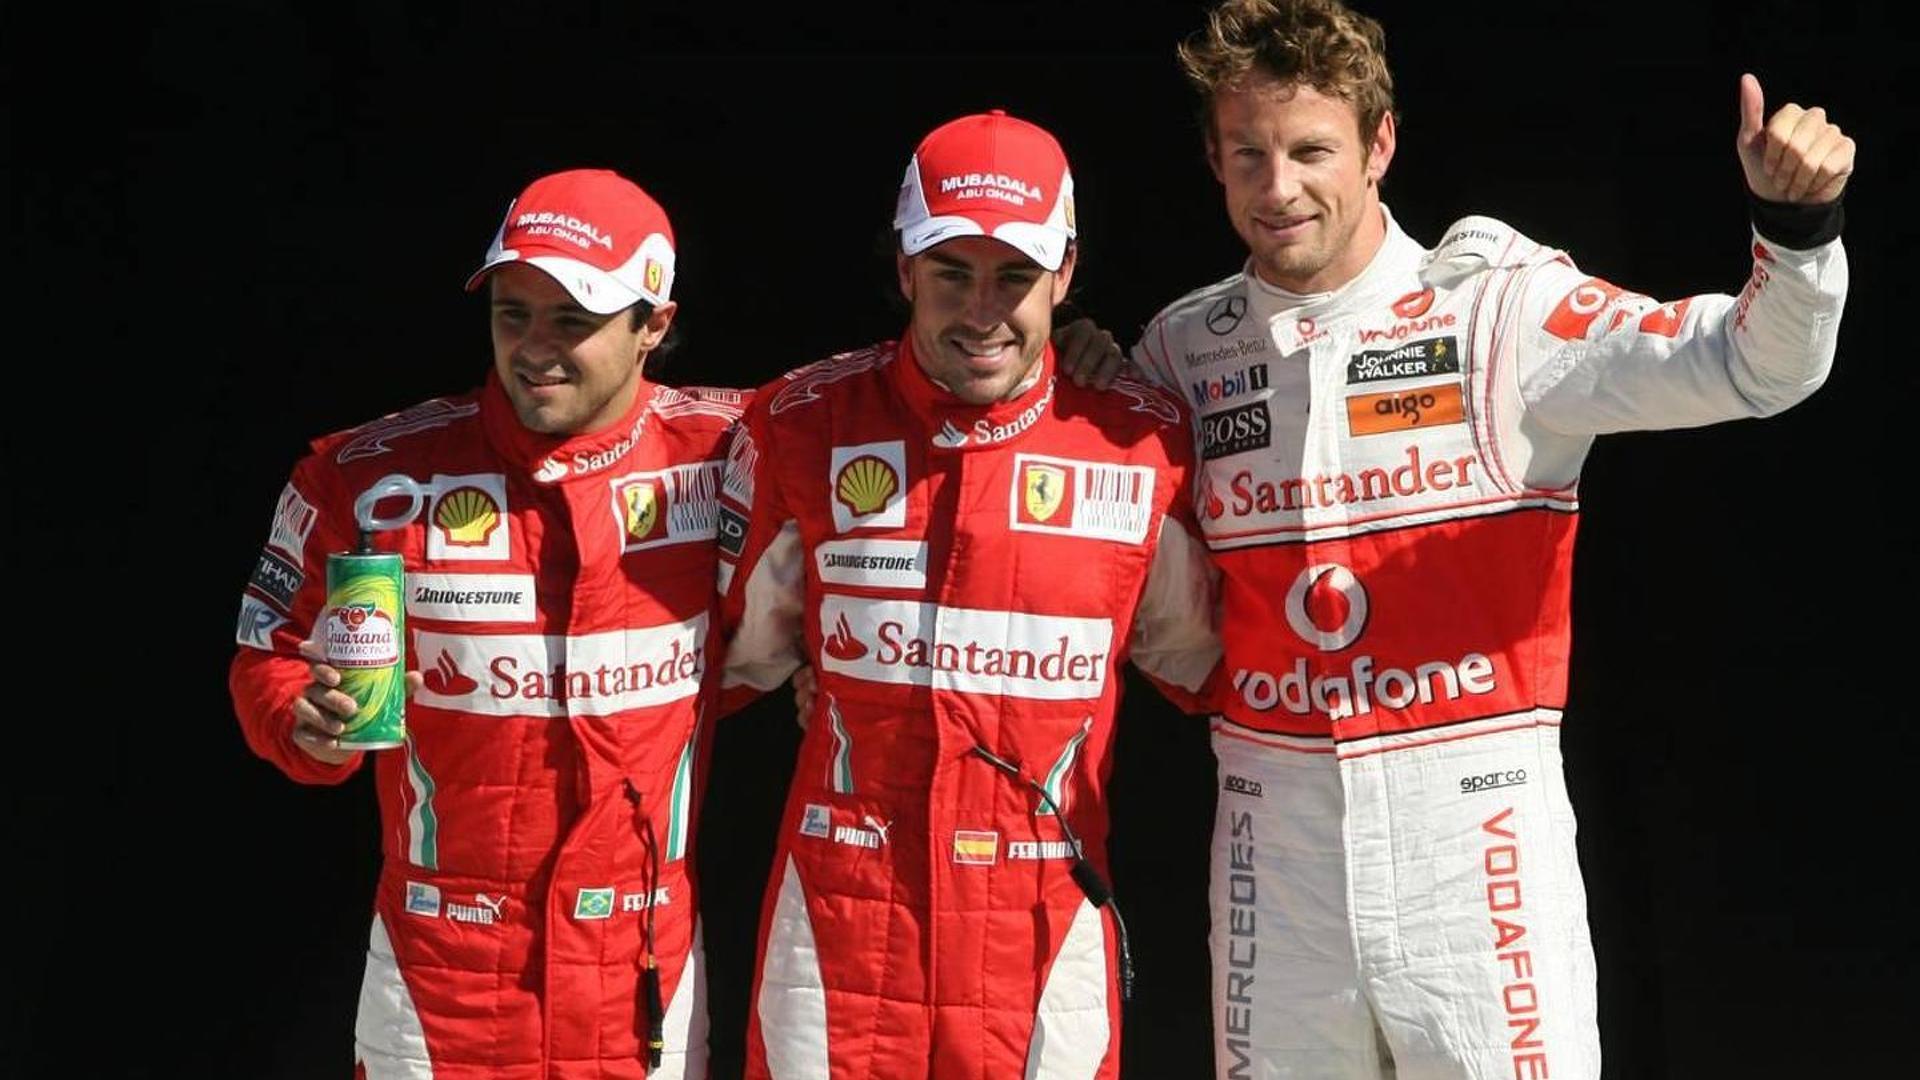 2010 Italian Grand Prix QUALIFYING - RESULTS